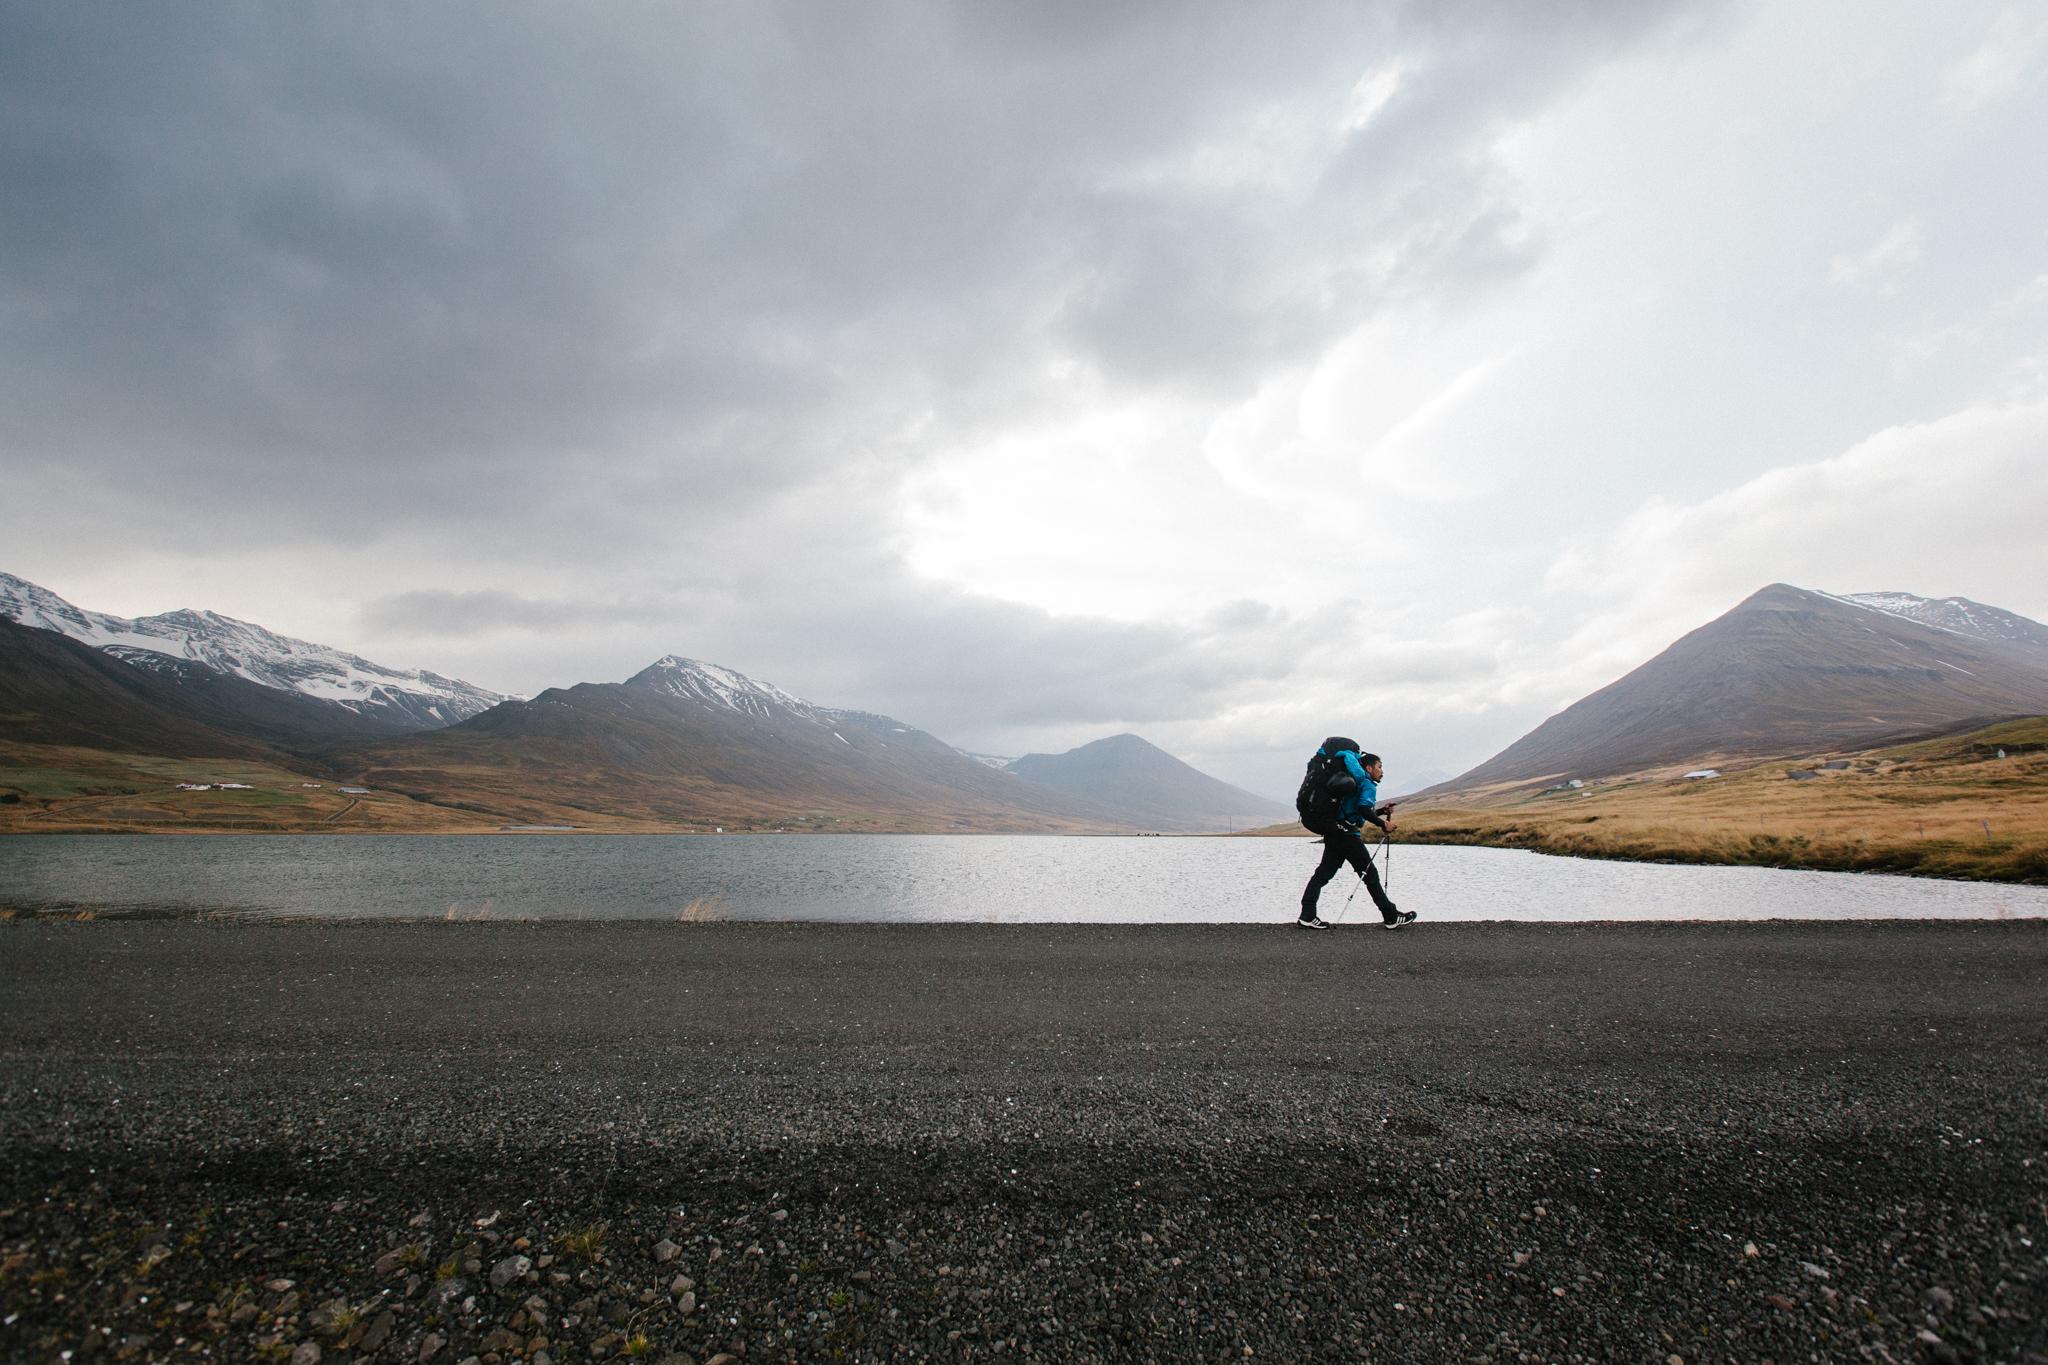 Iceland-Week2-5DMkII-6.jpg